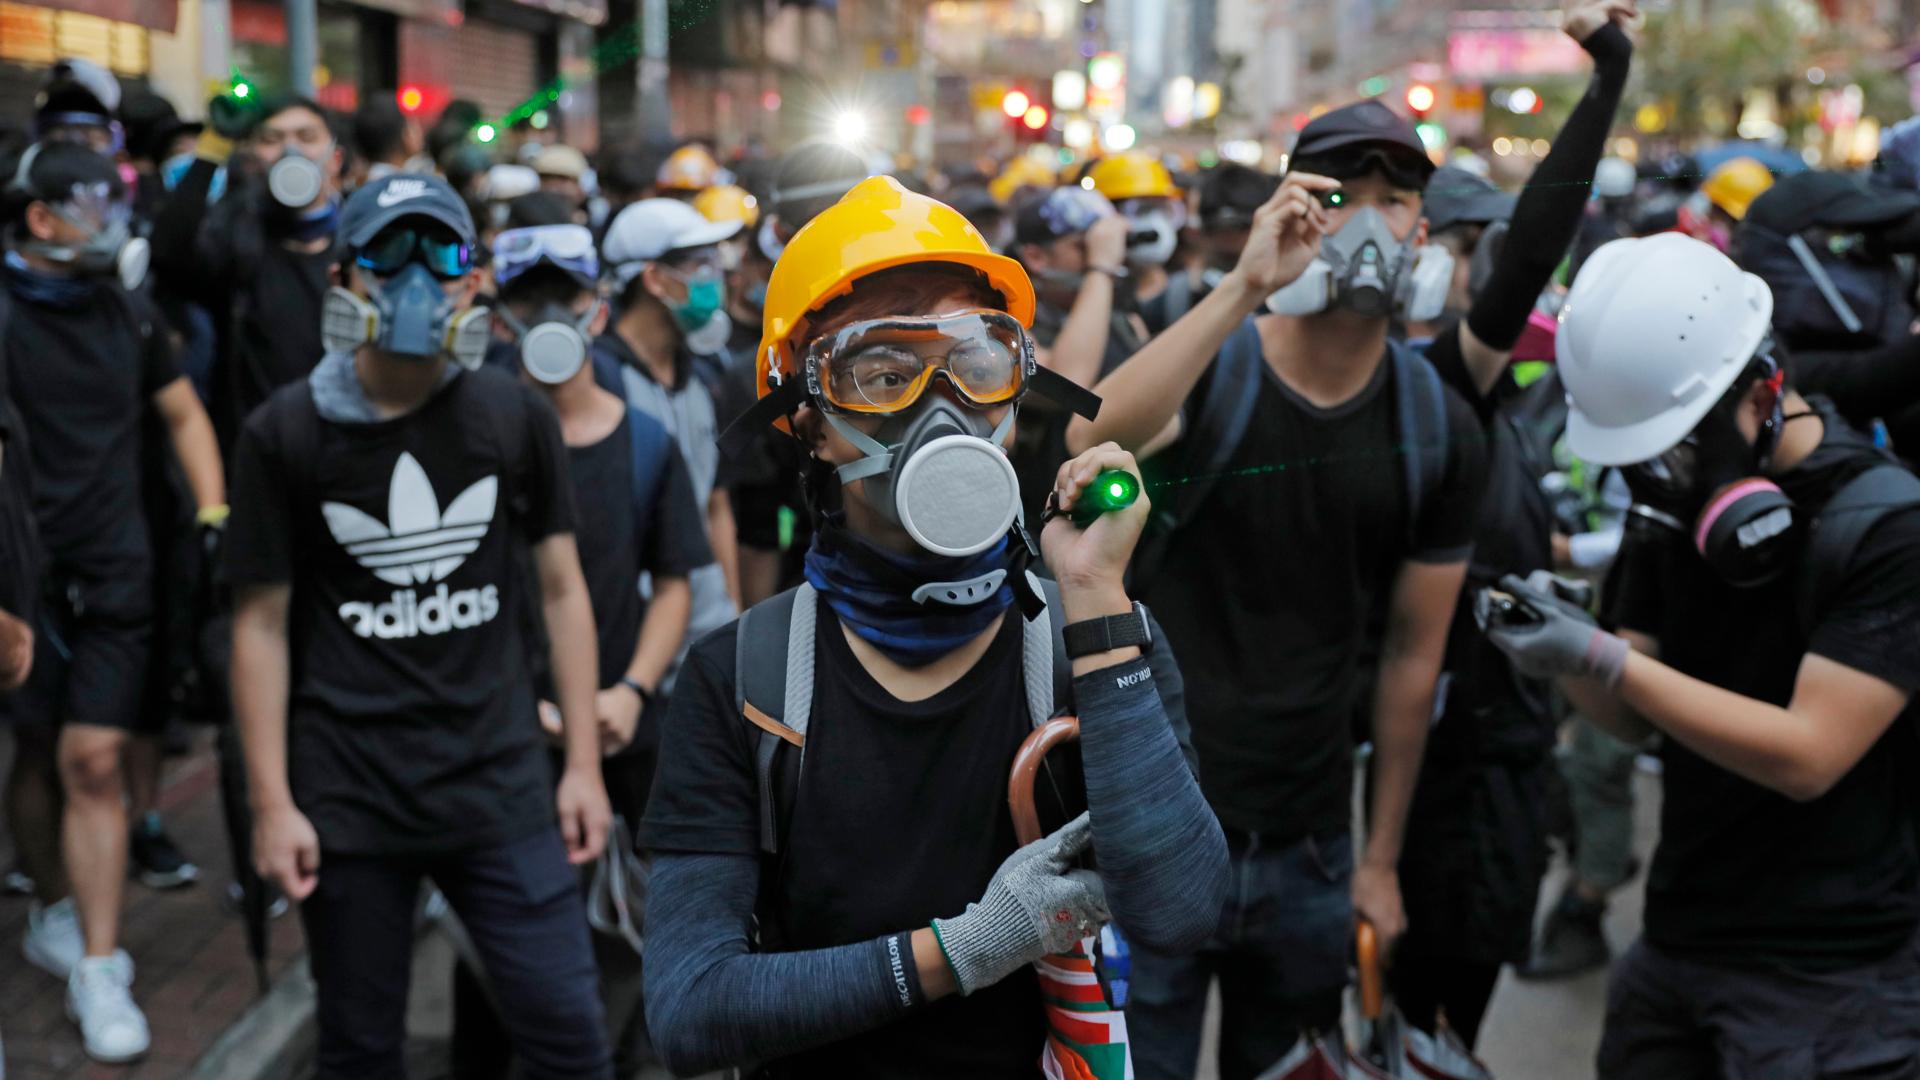 Resultado de imagen para Protestas en Hong Kong sabado 31 de agosto